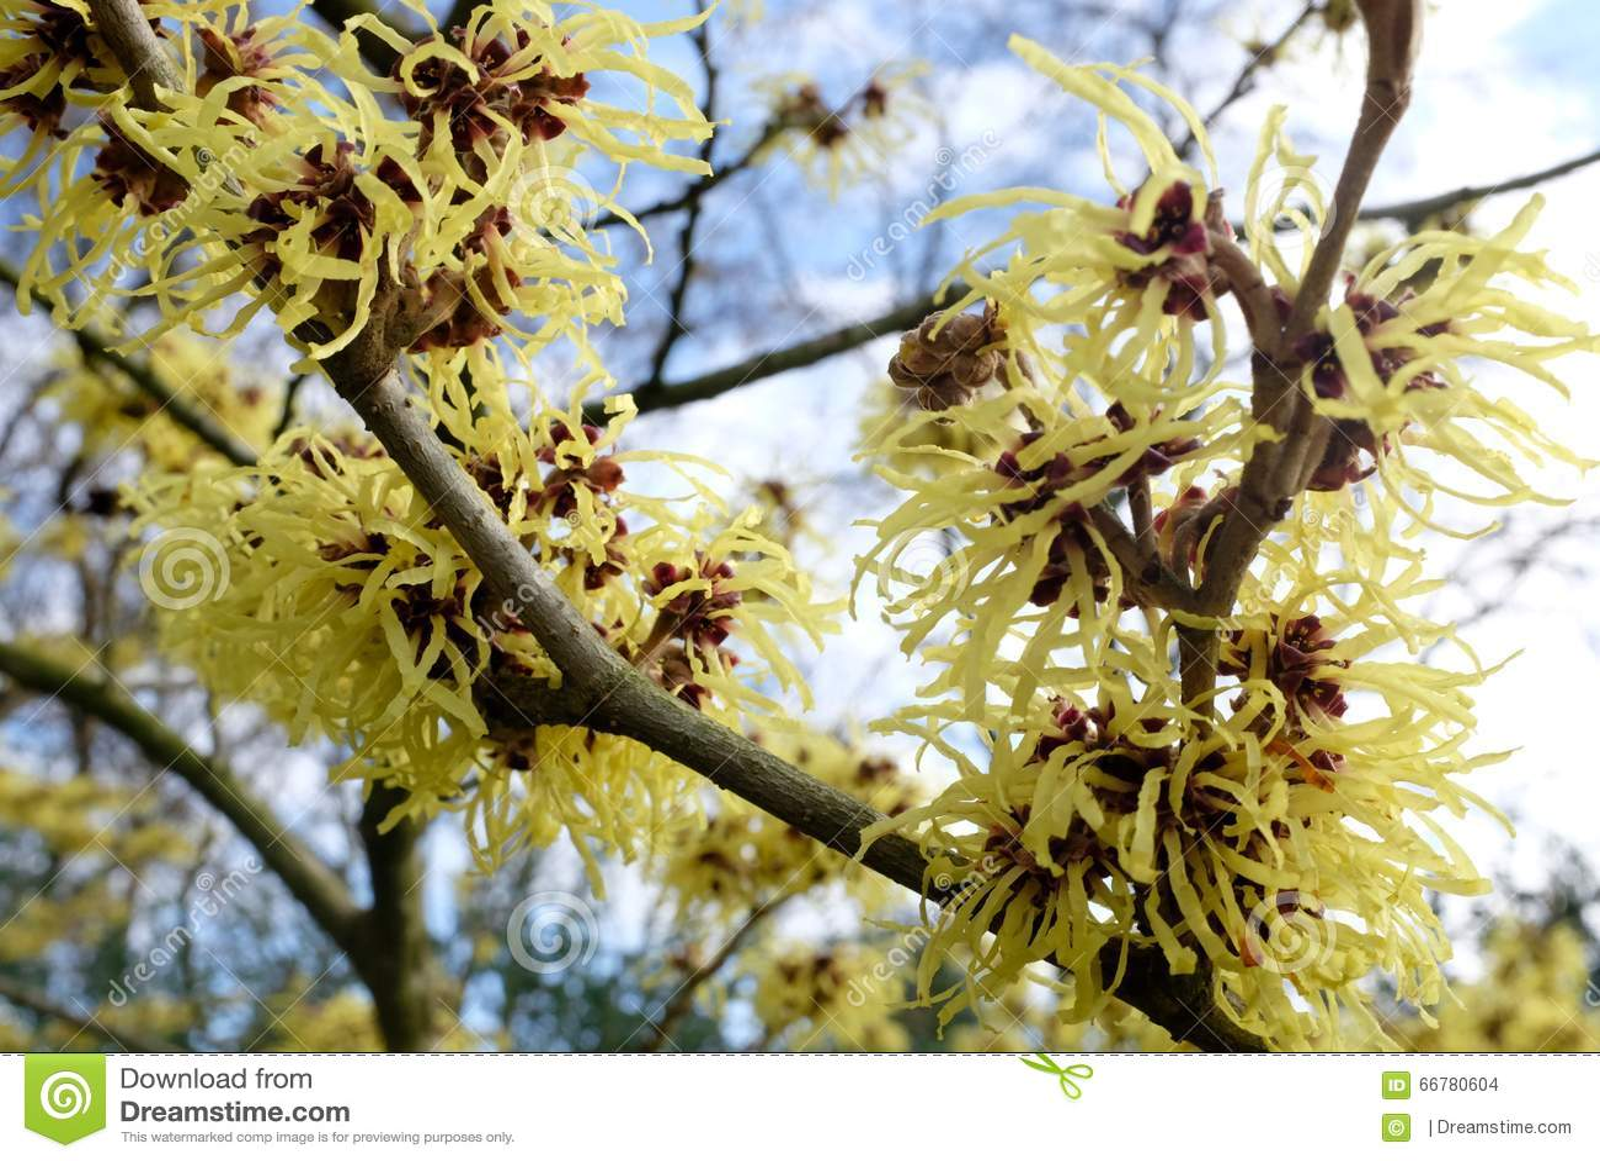 Detail Of Yellow Flowers Of The Hamamelis Mollis Stock Photo